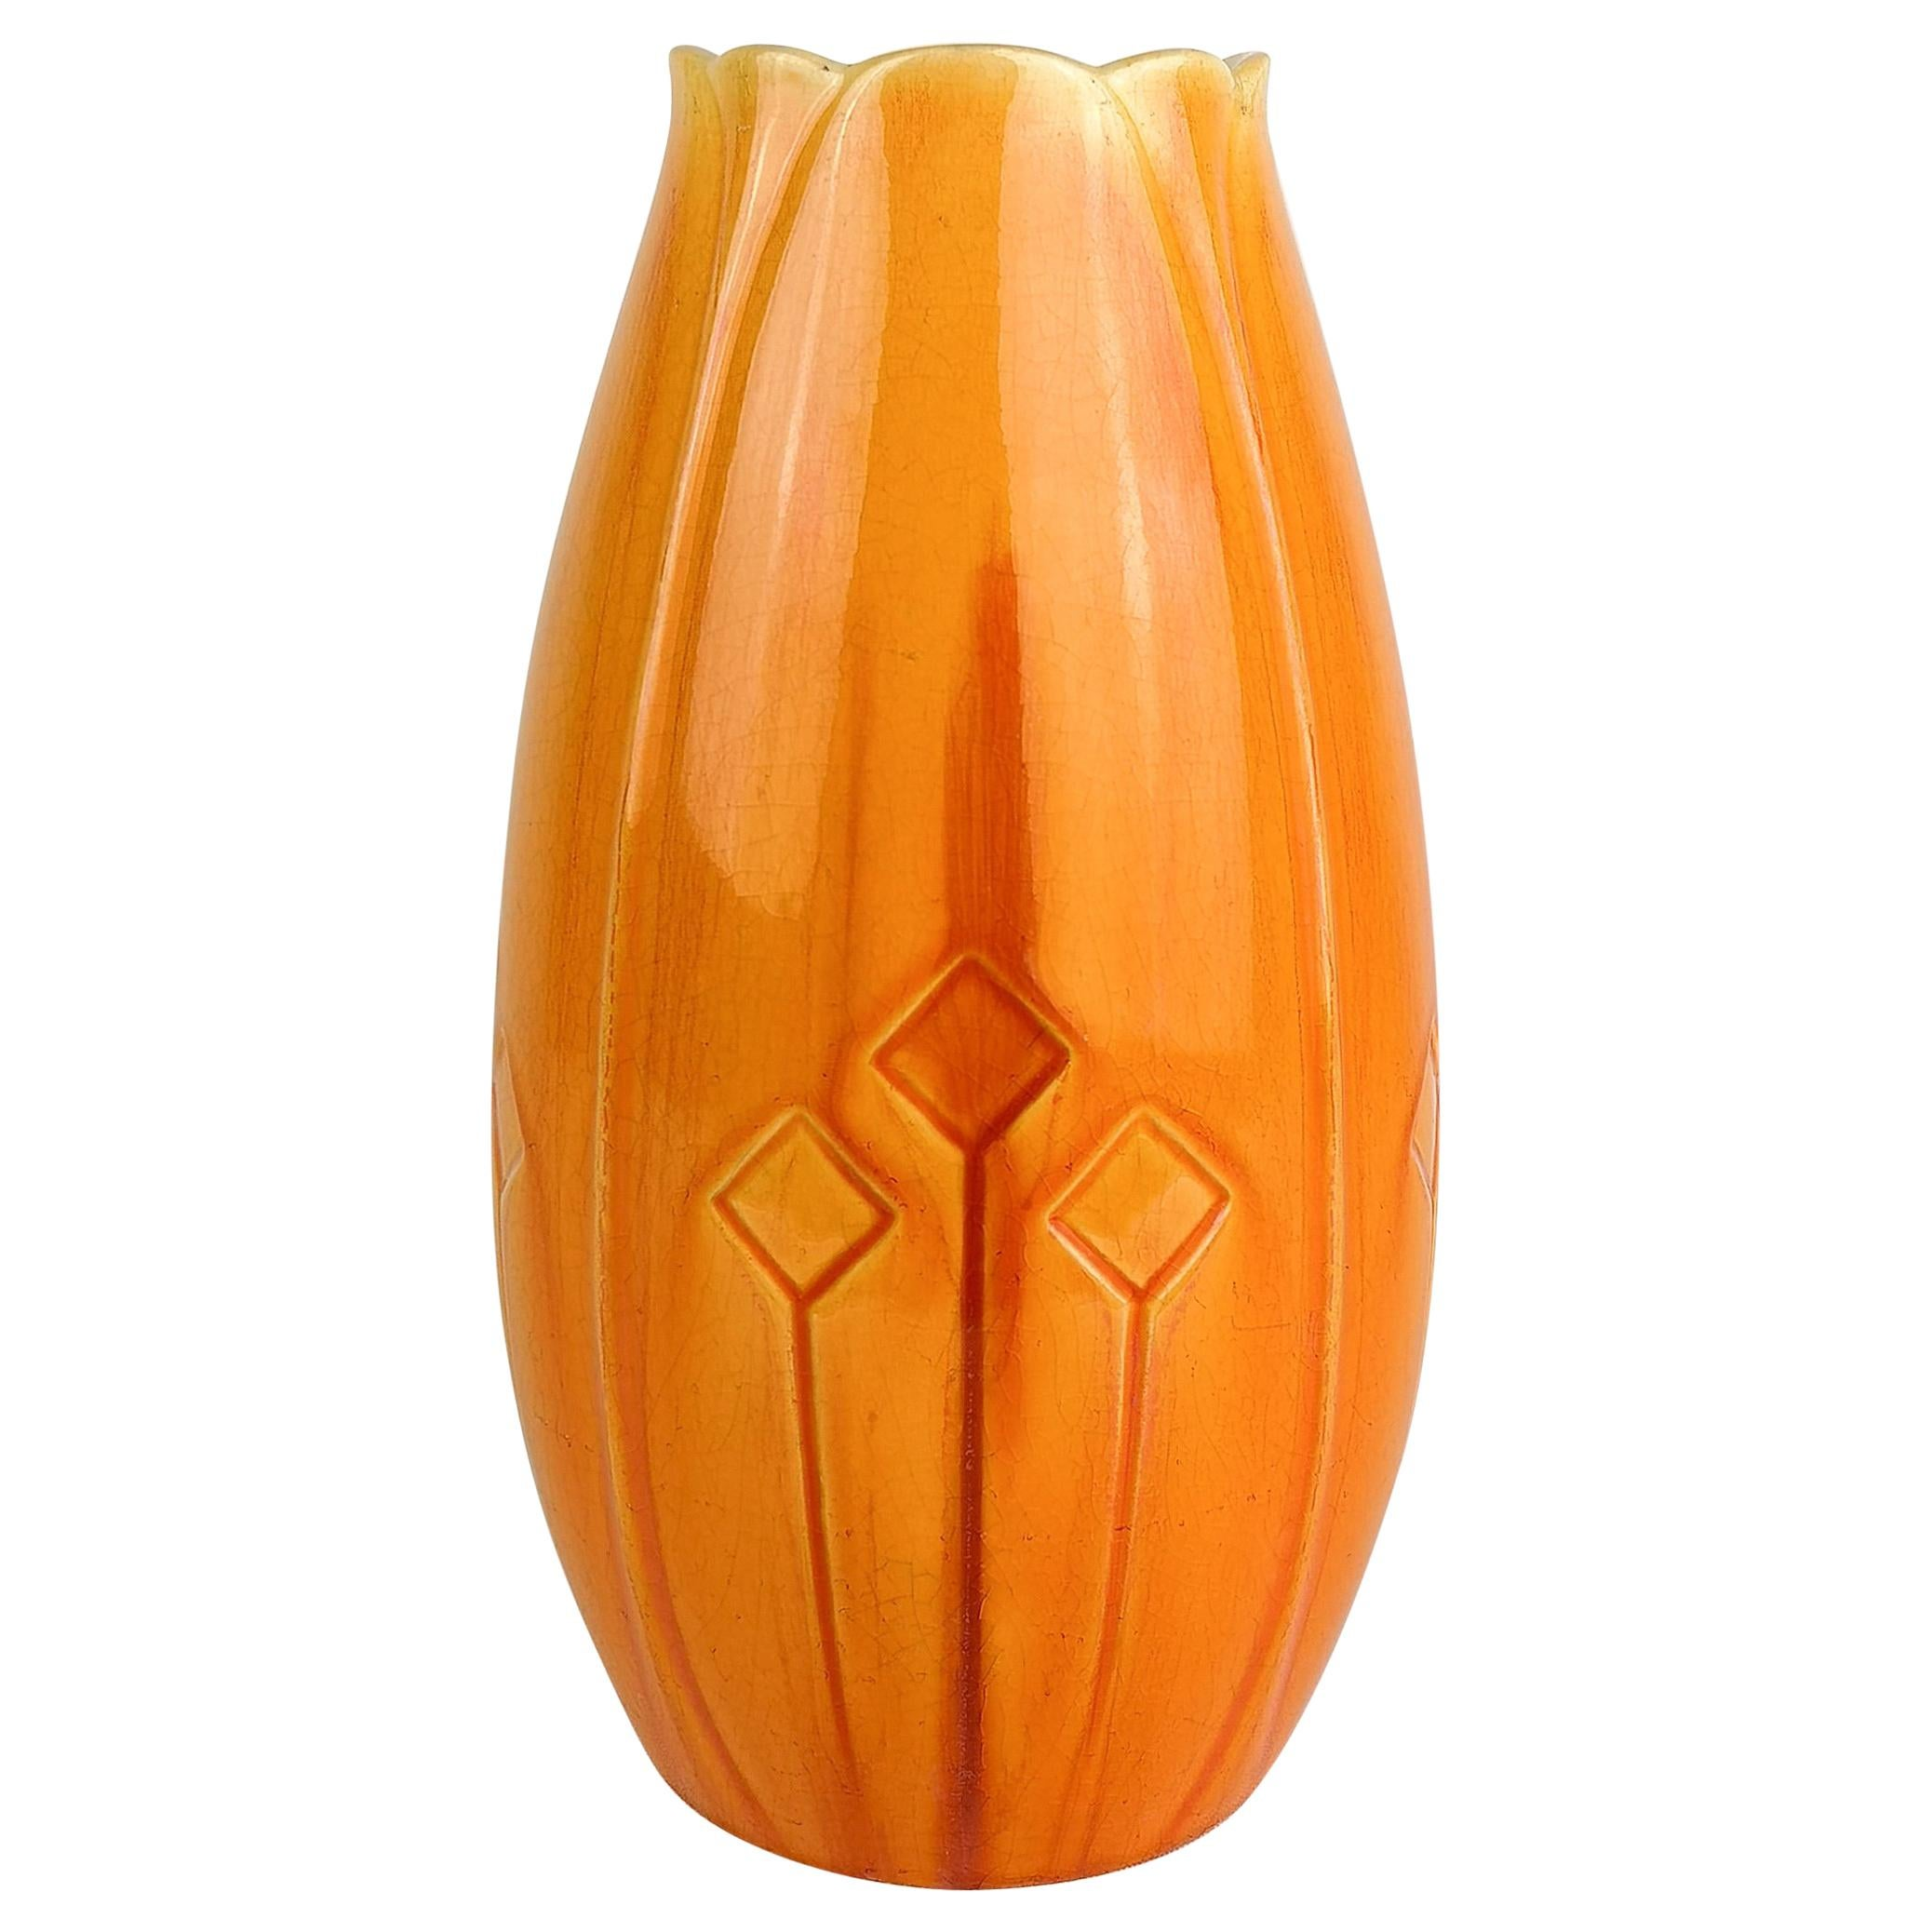 Art Nouveau Vase Rörstrand Alf Wallander